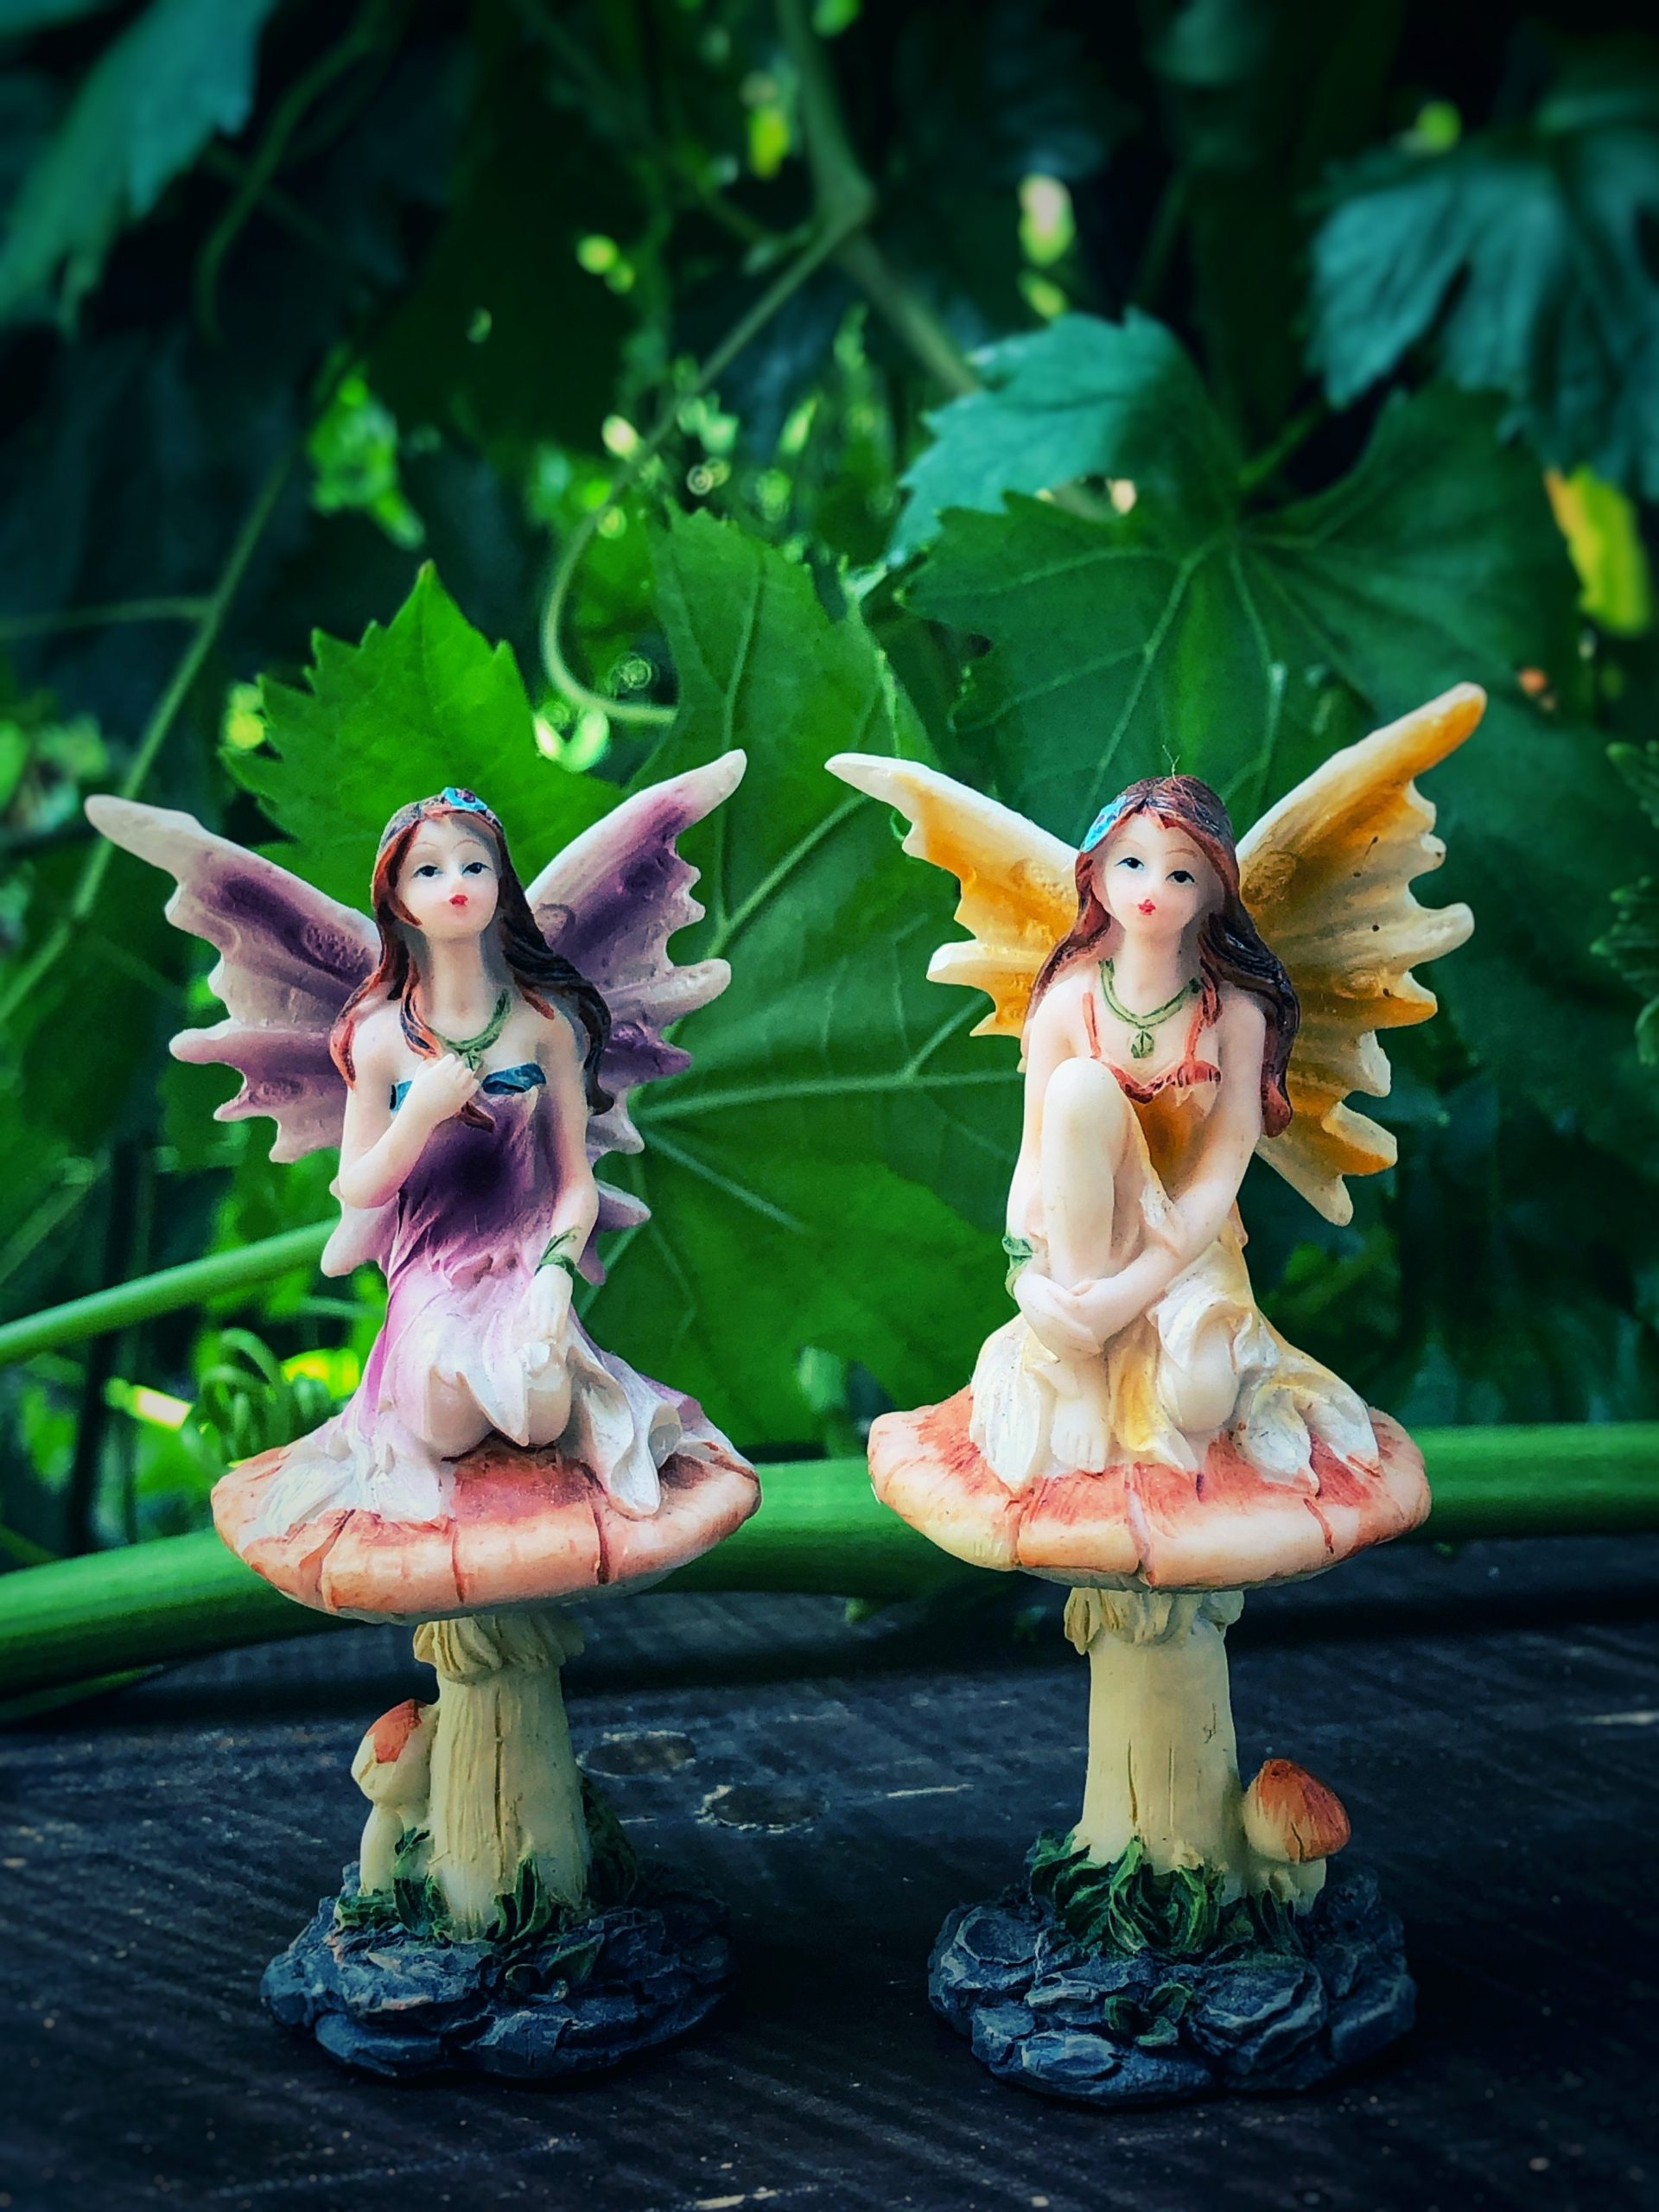 Fairy on toadstool